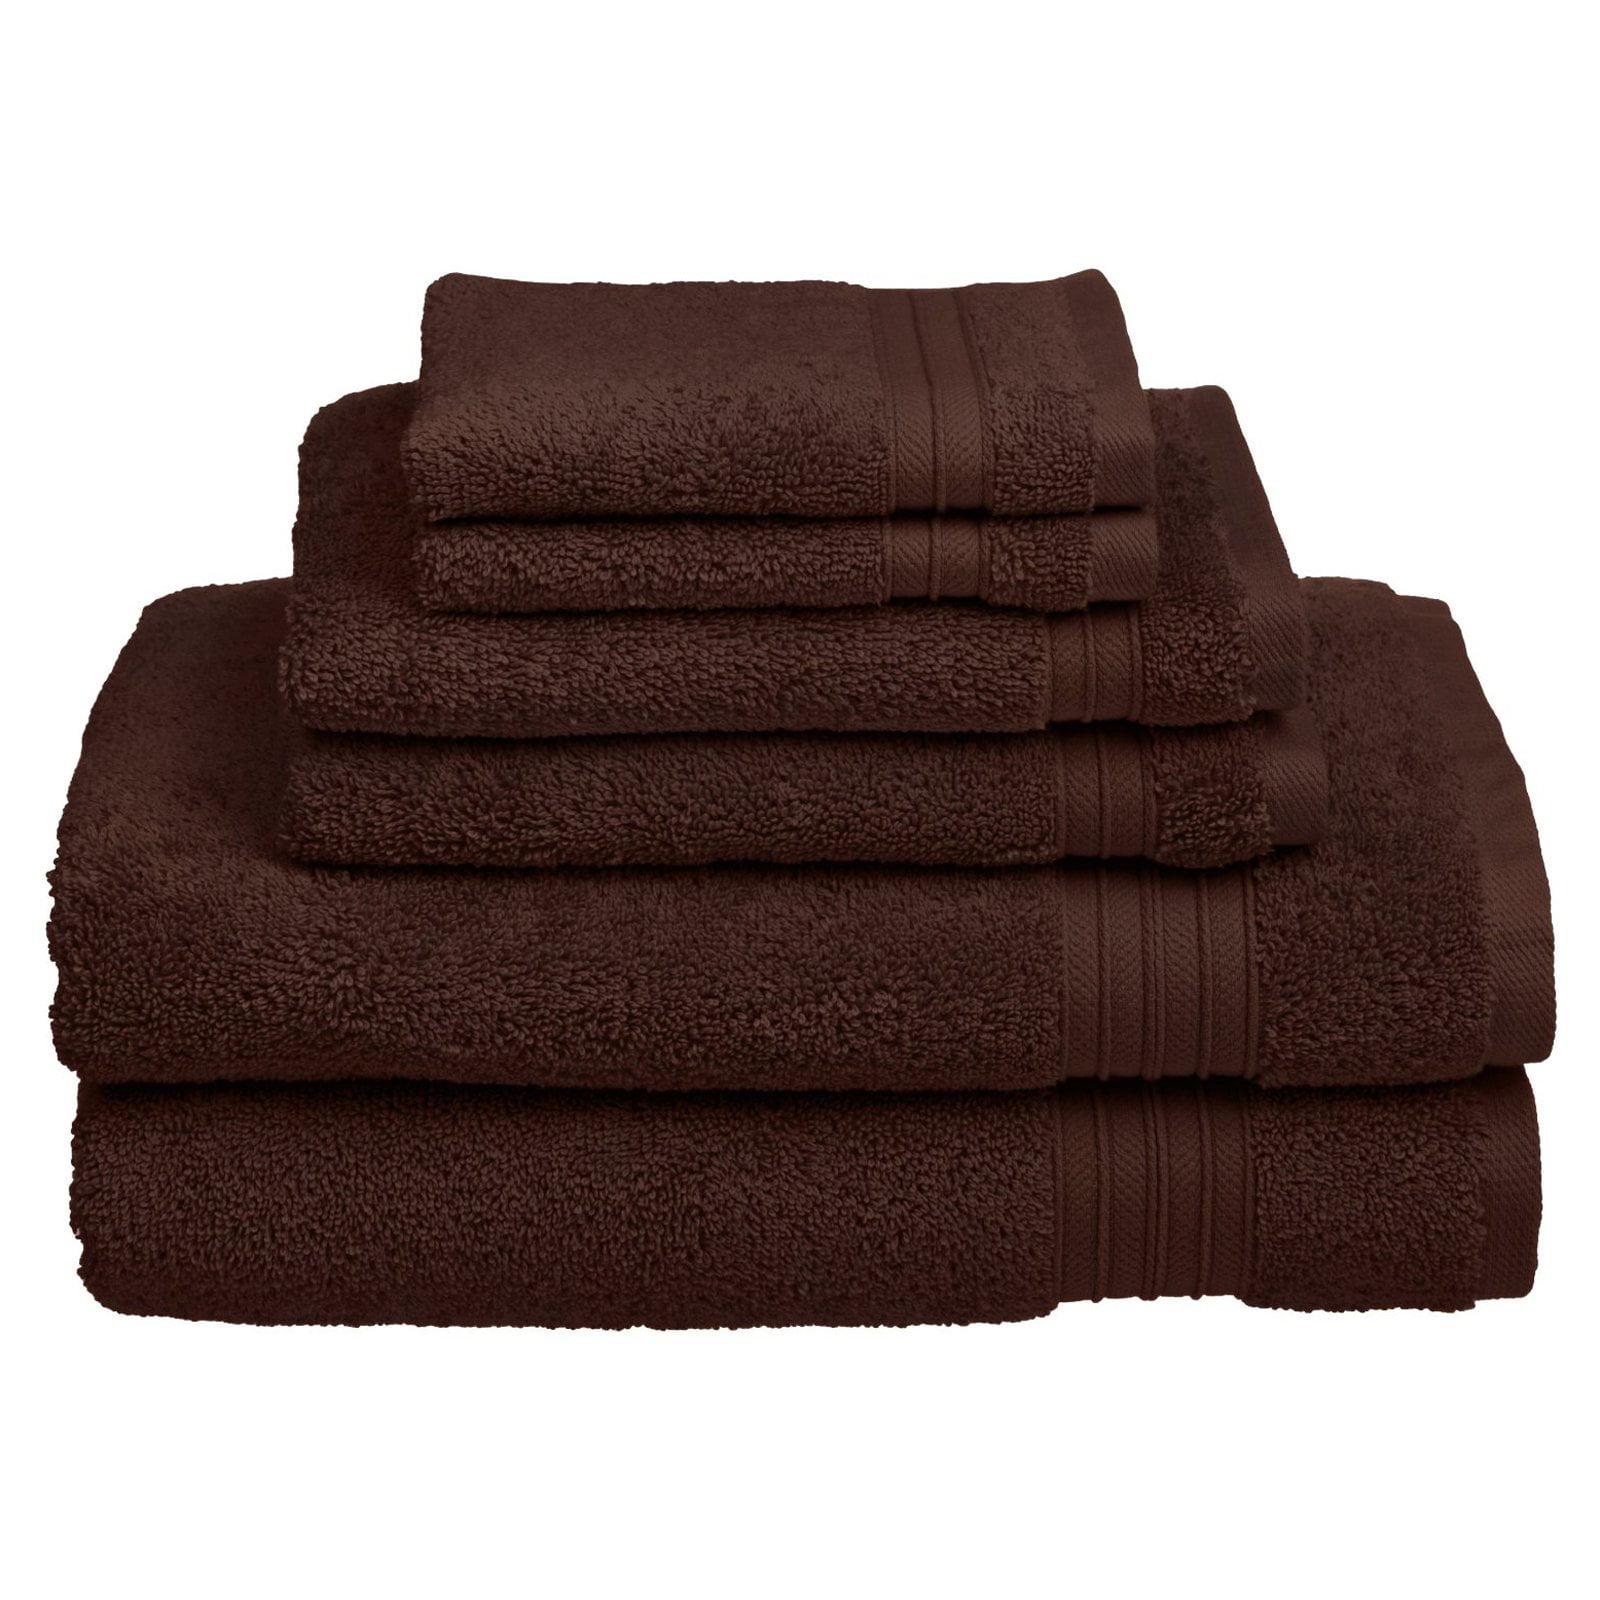 CLEARANCE Tidal Charcoal 100/% Cotton Bathroom Towels